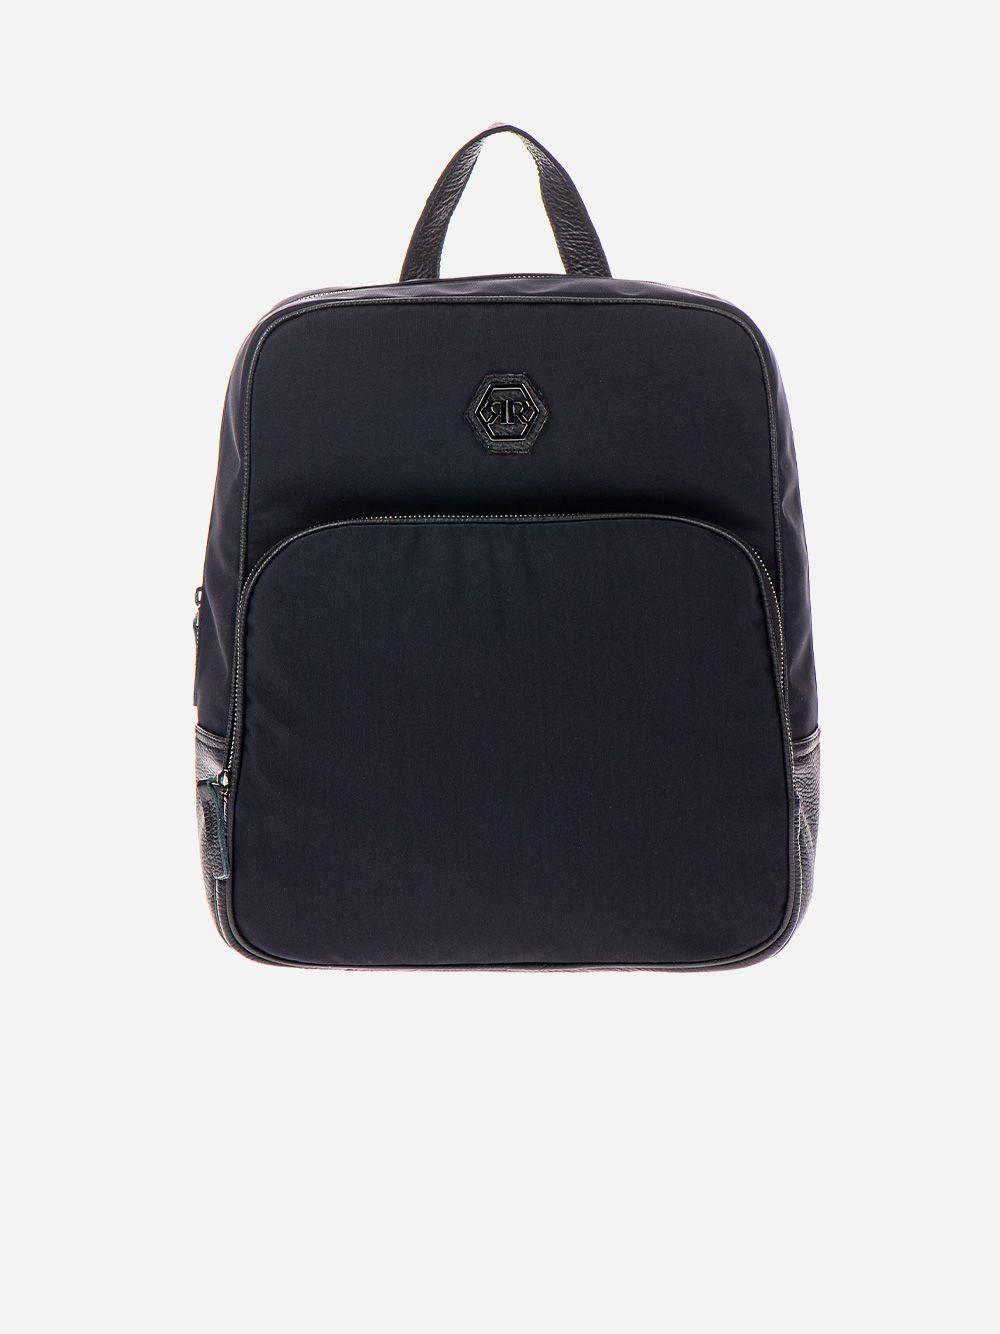 Black Nylon Backpack | Rufel